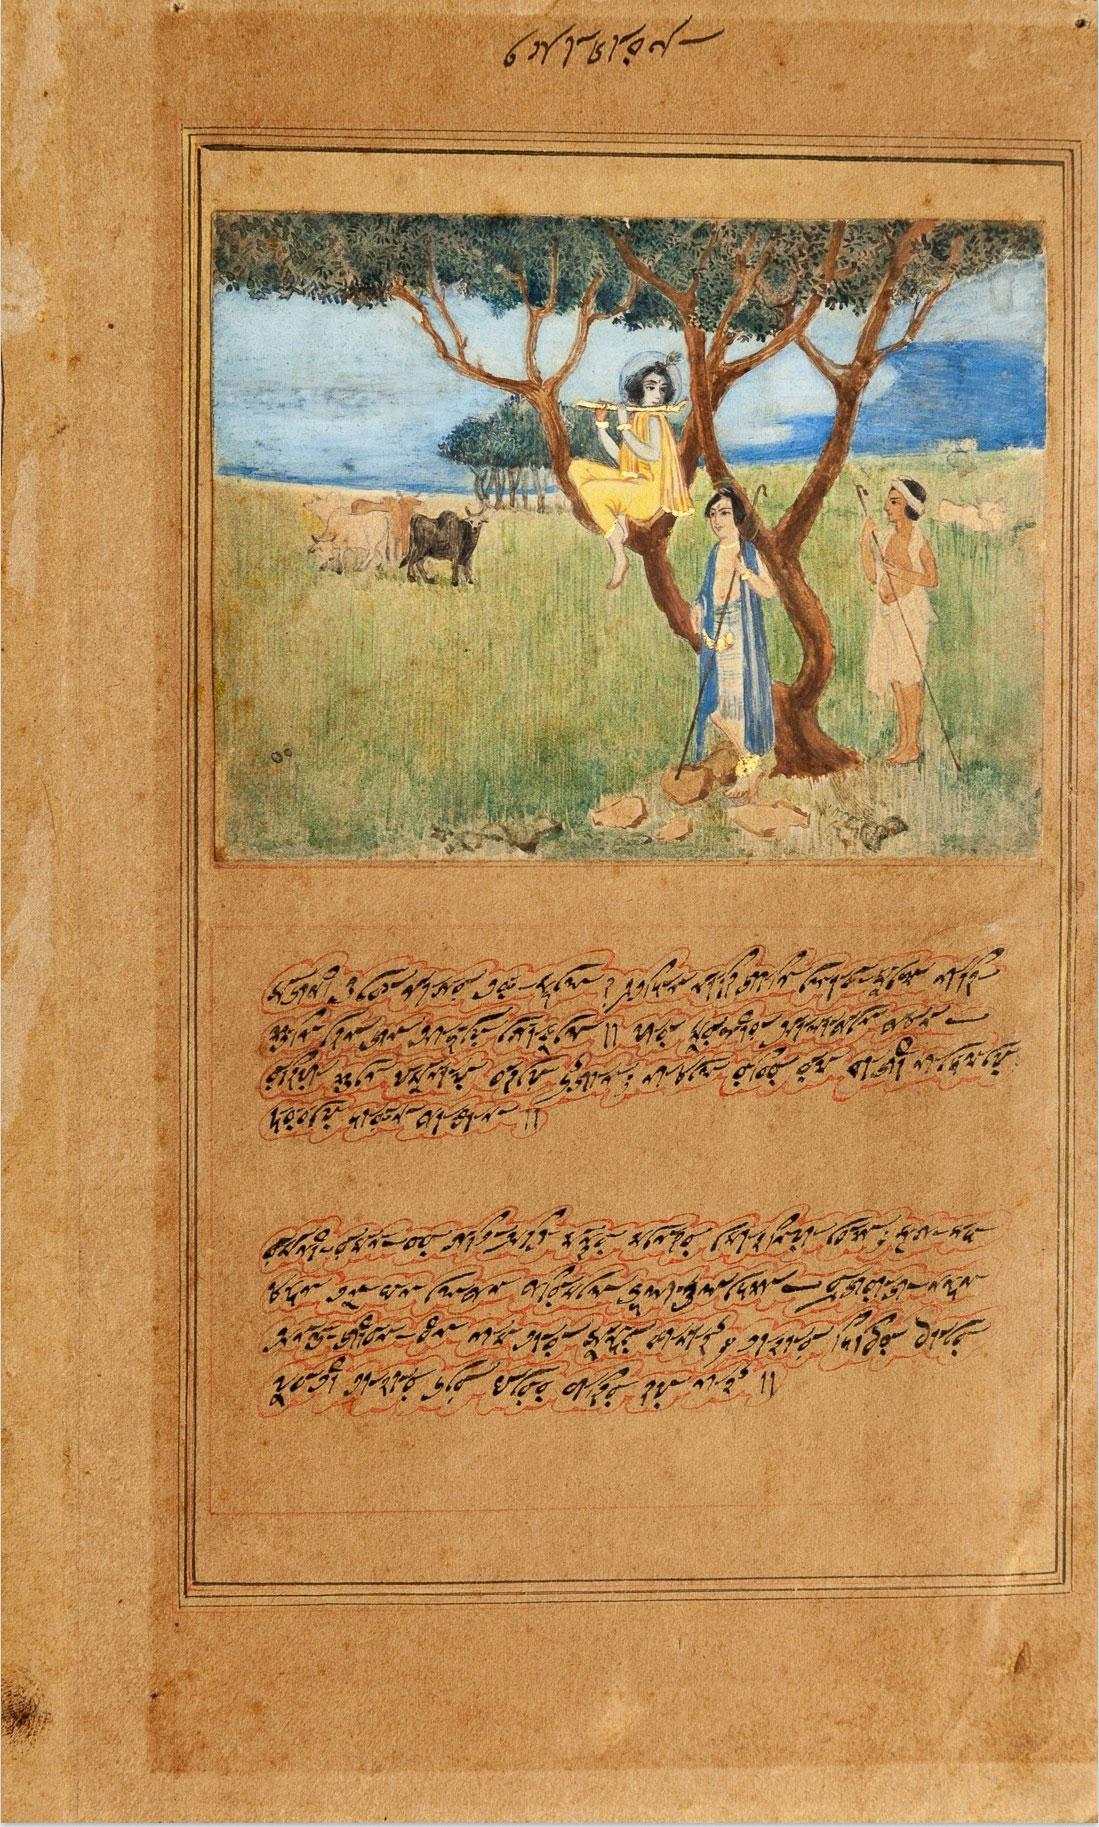 Krishna as Cowboy by Abanindranath Tagore 1895-1897